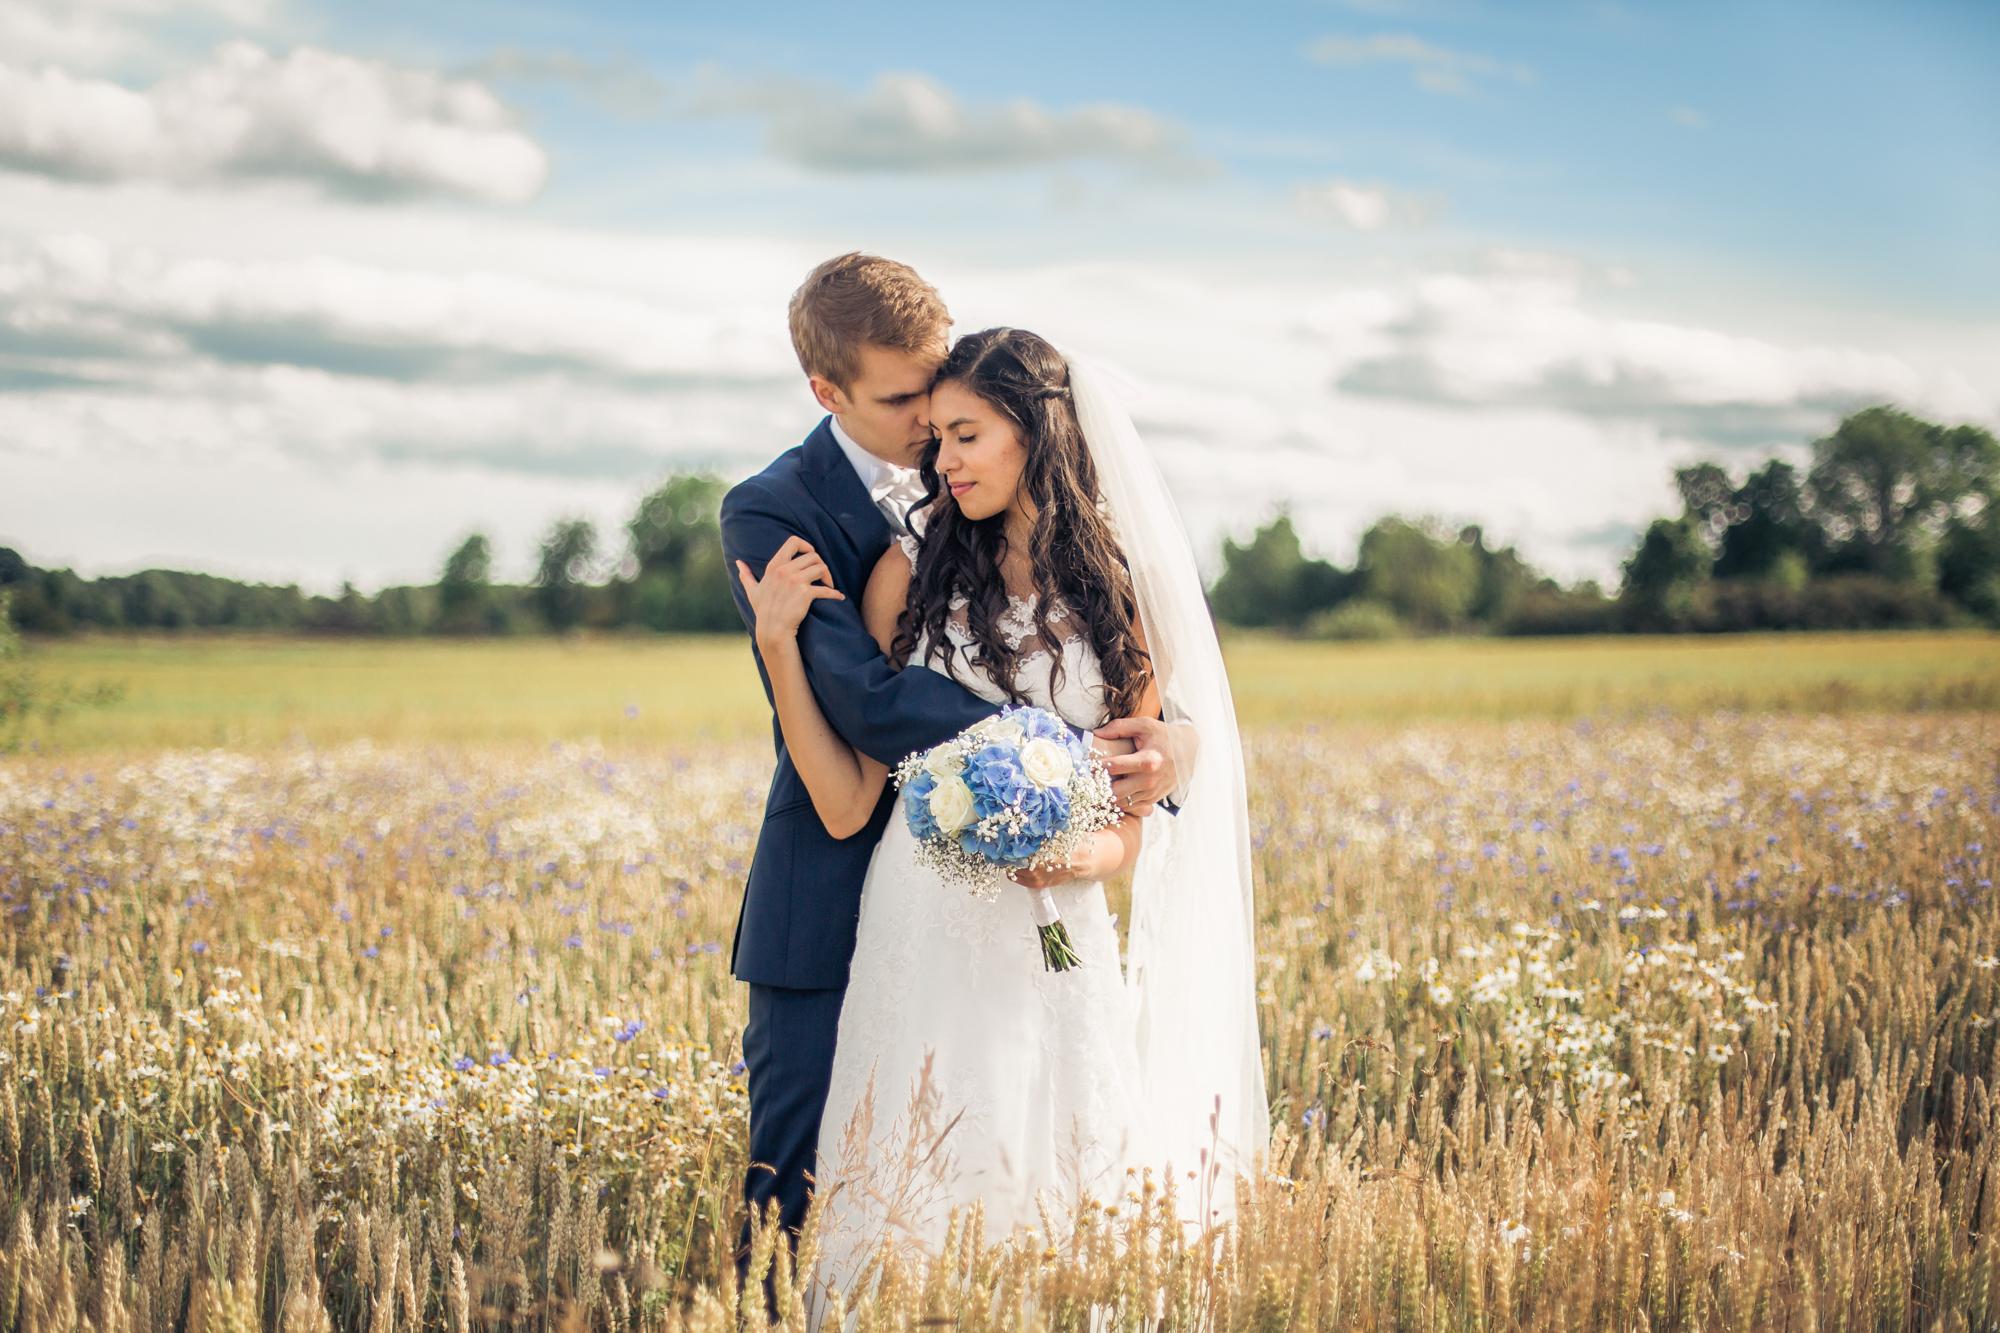 SNEAK PEEK: J♥J SUMMER WEDDING